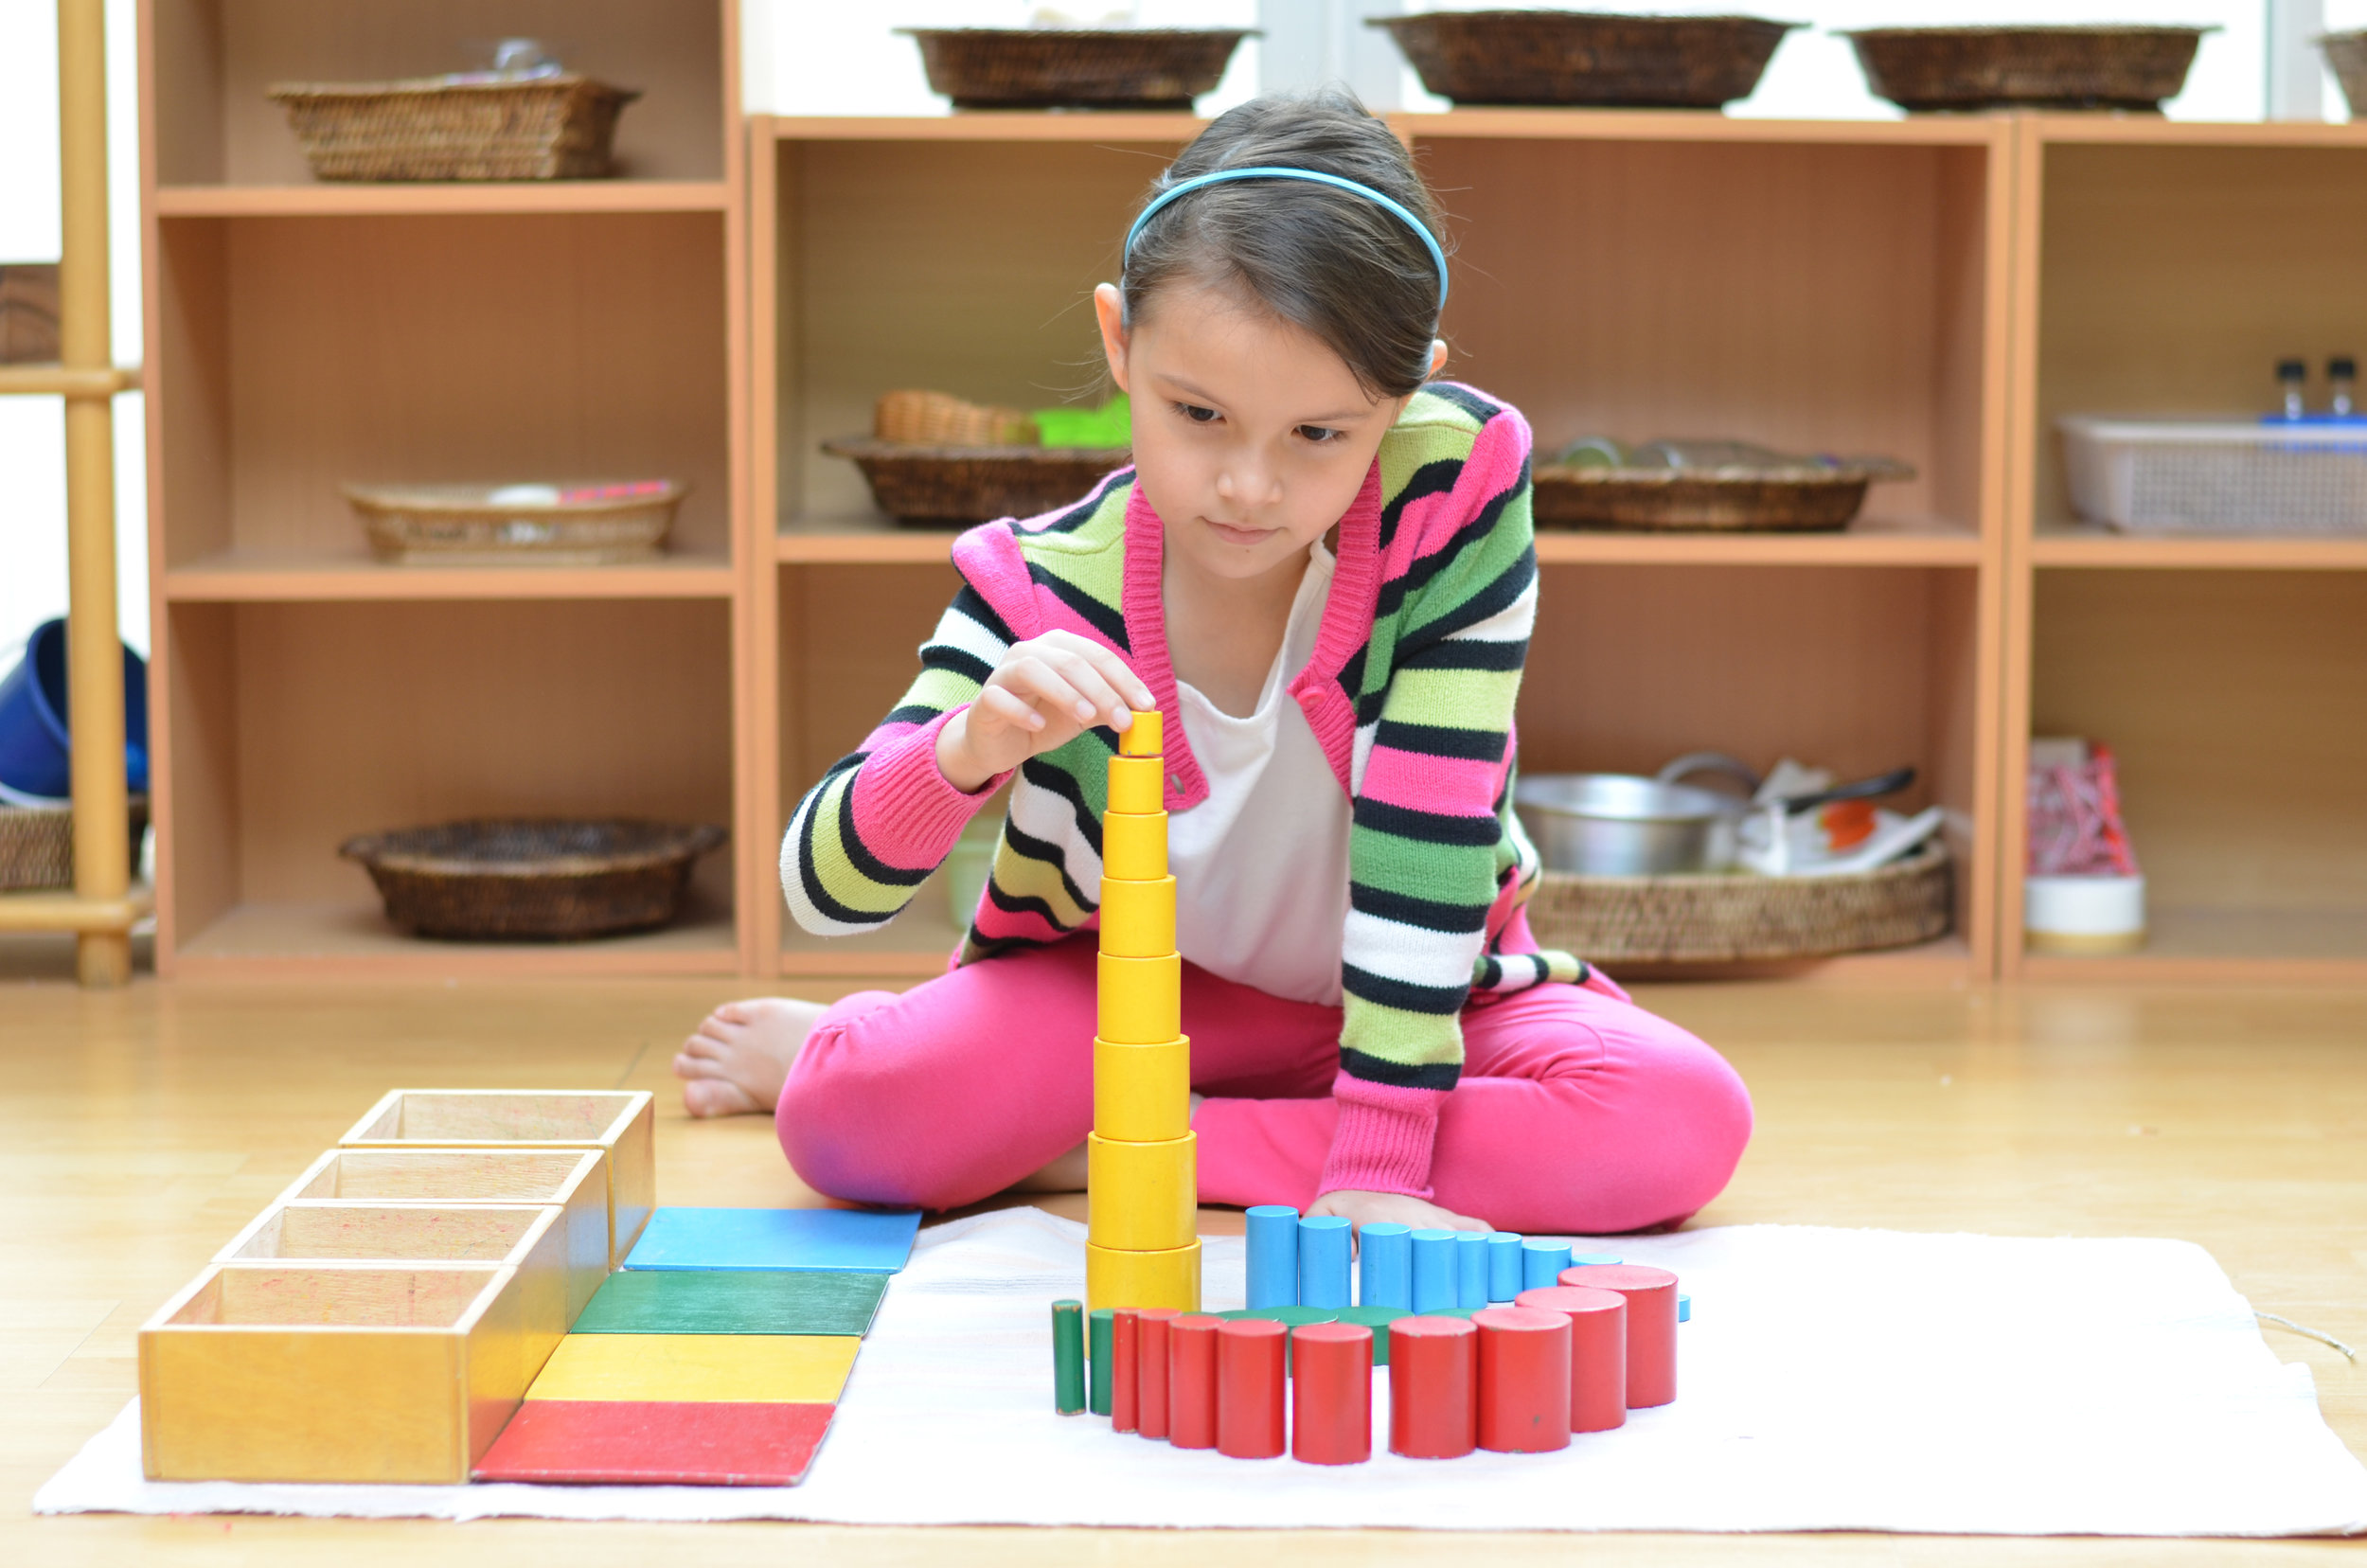 Montessori manipulatives